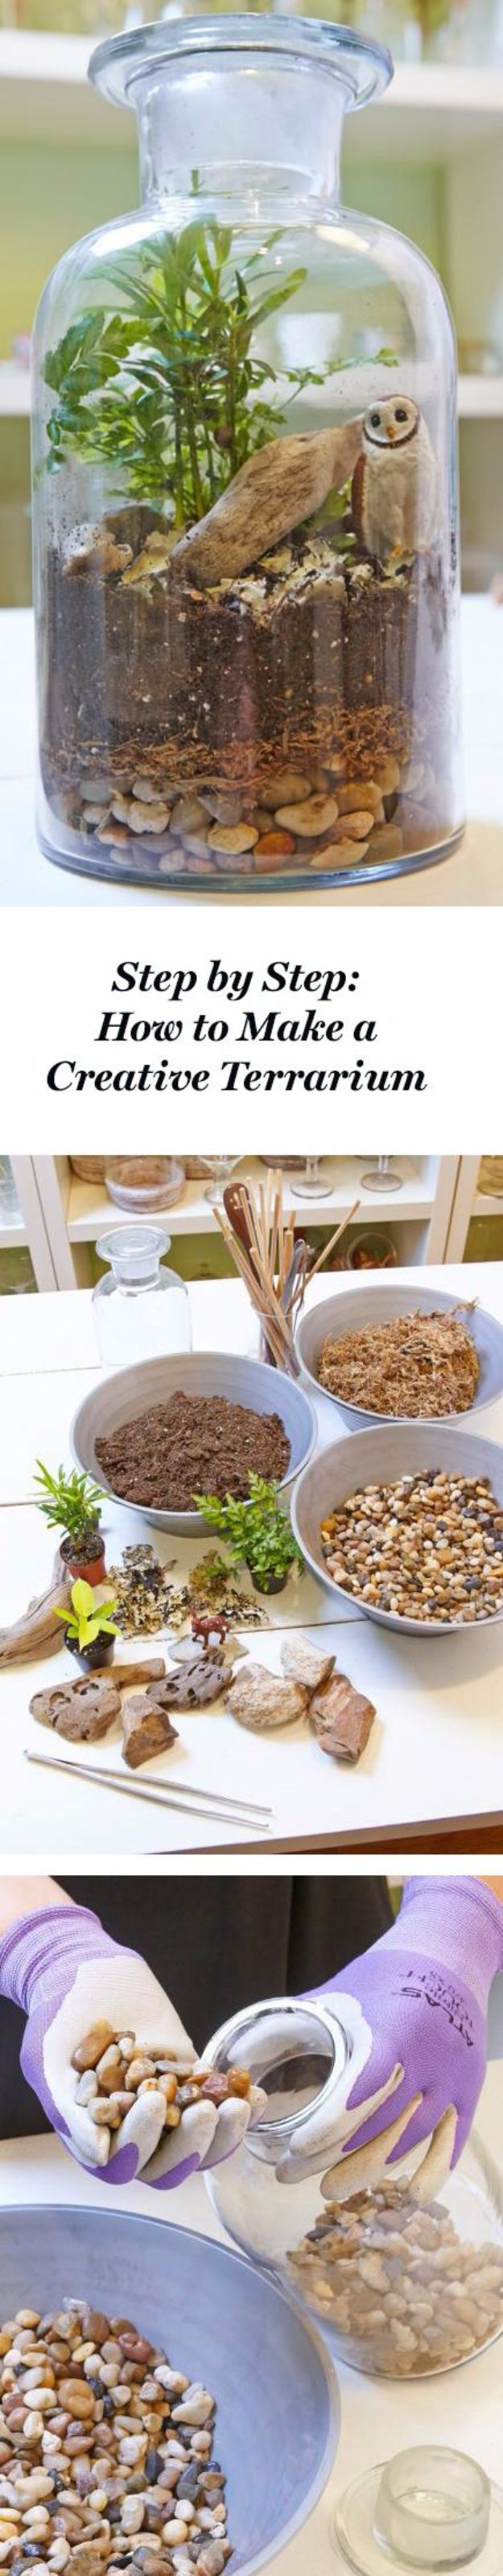 DIY Terrarium Ideas - Creative Terrarium - Cool Terrariums and Crafts With Mason Jars, Succulents, Wood, Geometric Designs and Reptile, Acquarium - Easy DIY Terrariums for Adults and Kids To Make at Home